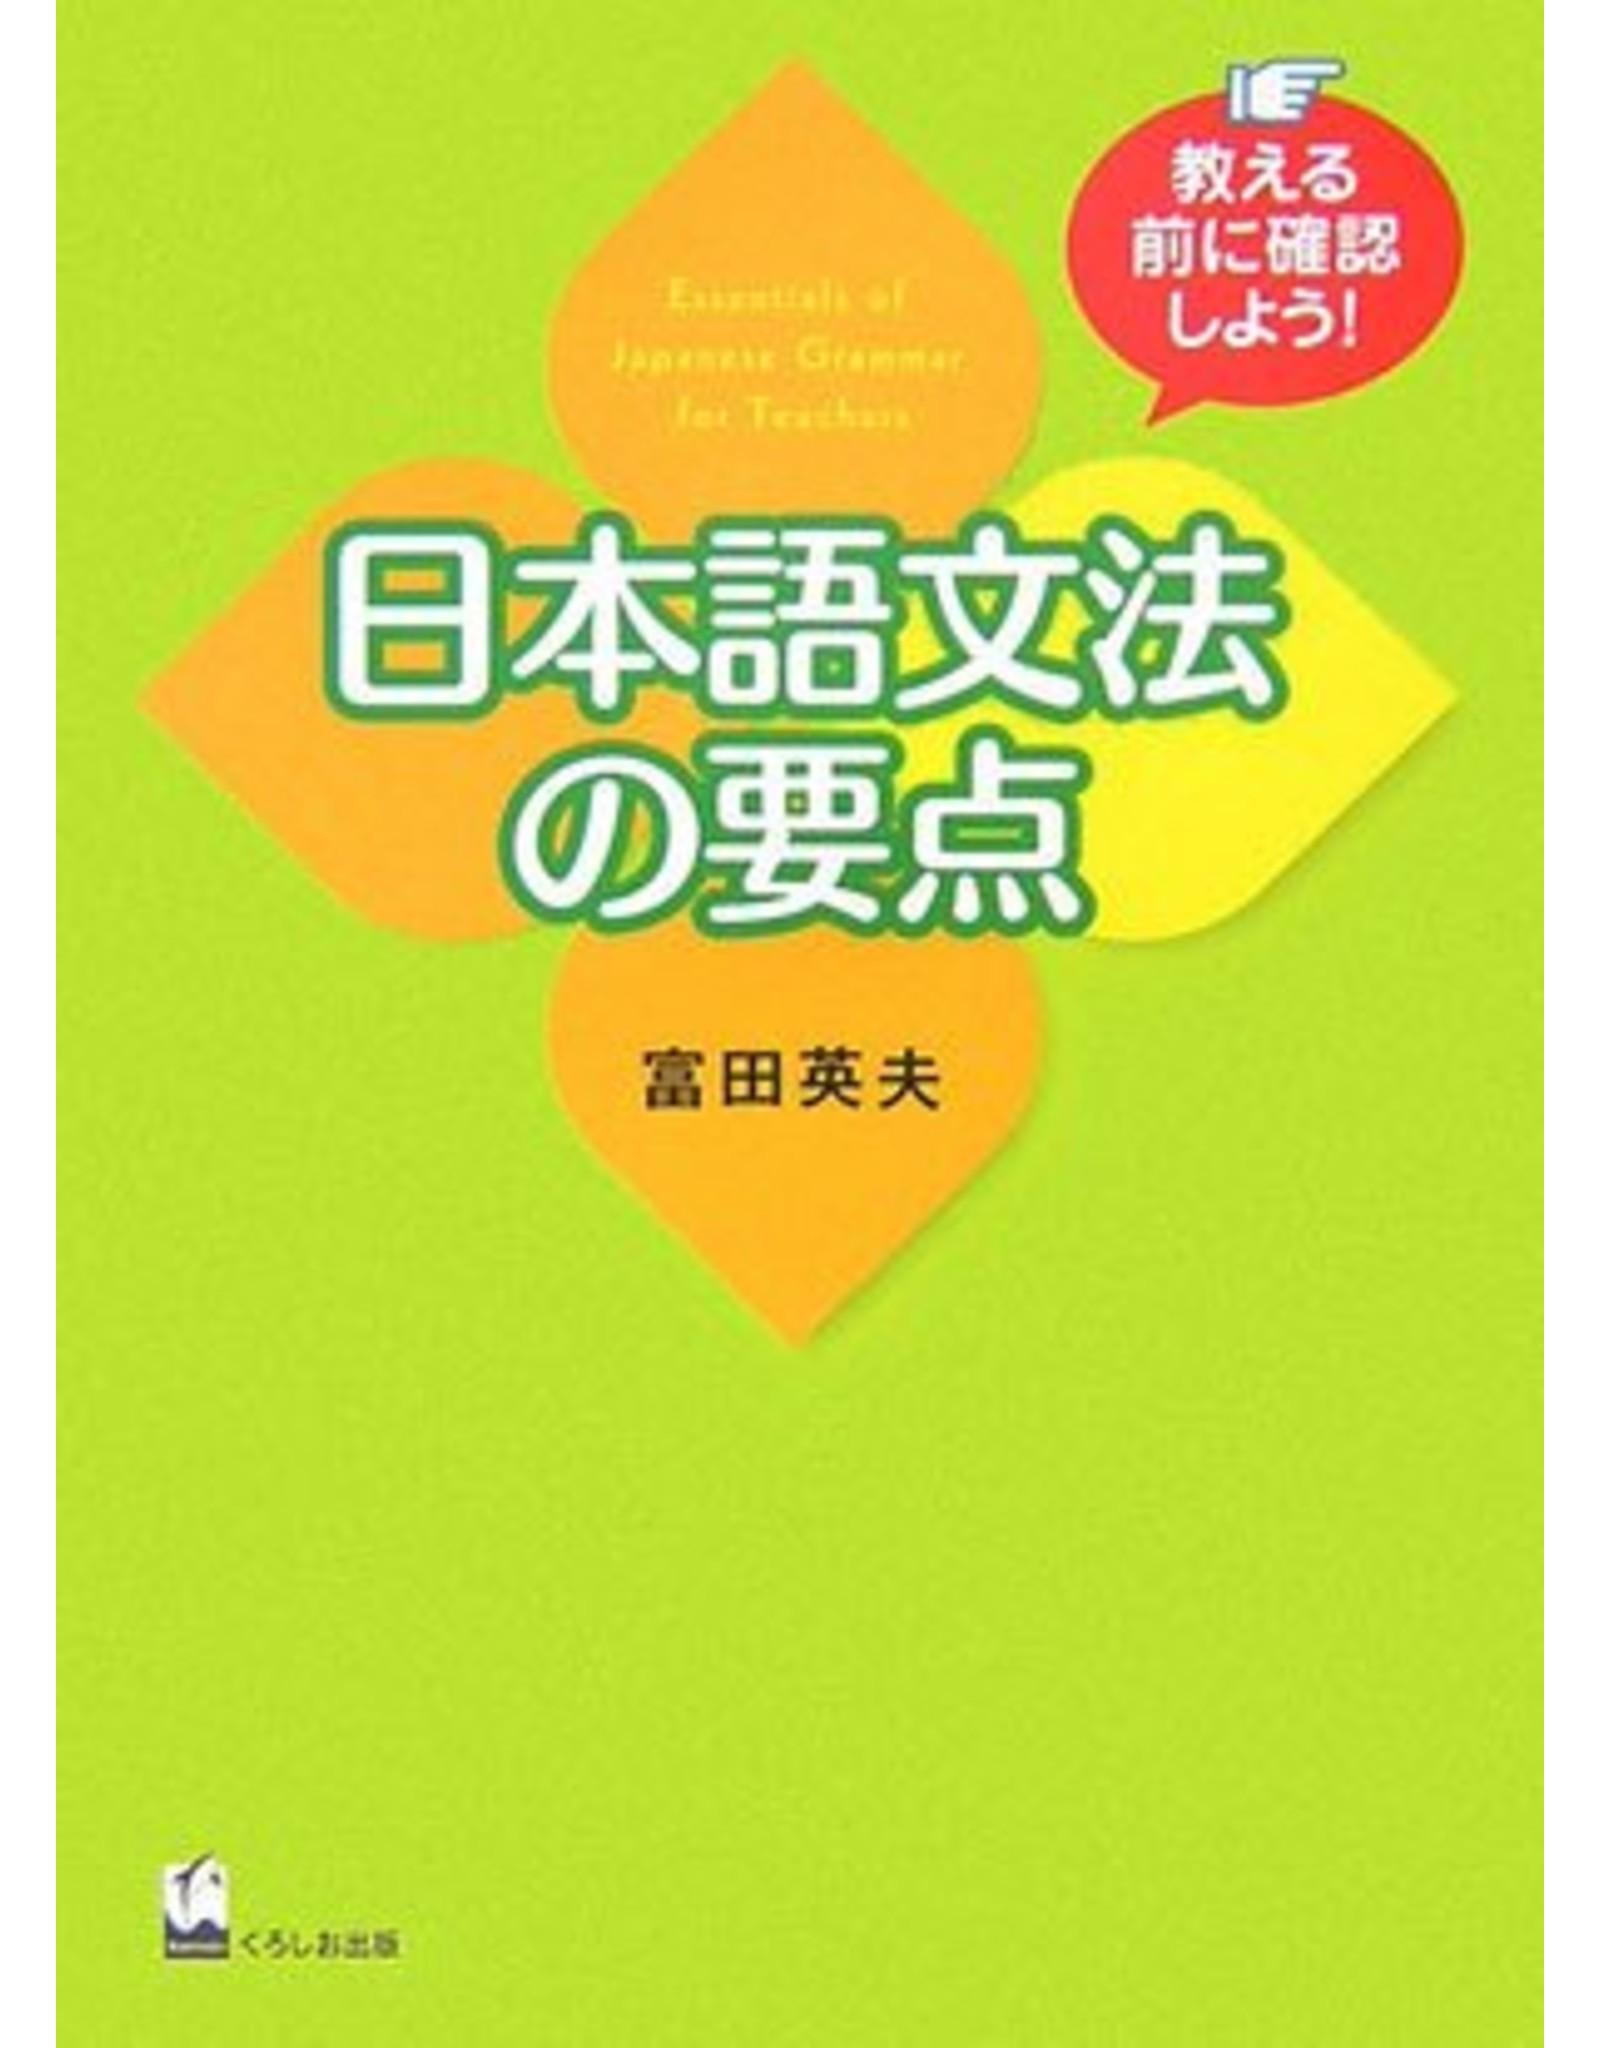 KUROSHIO ESSENTIALS JAPANESE GRAMMAR FOR TEACHERS - NIHONGO BUNPO NO YOTEN